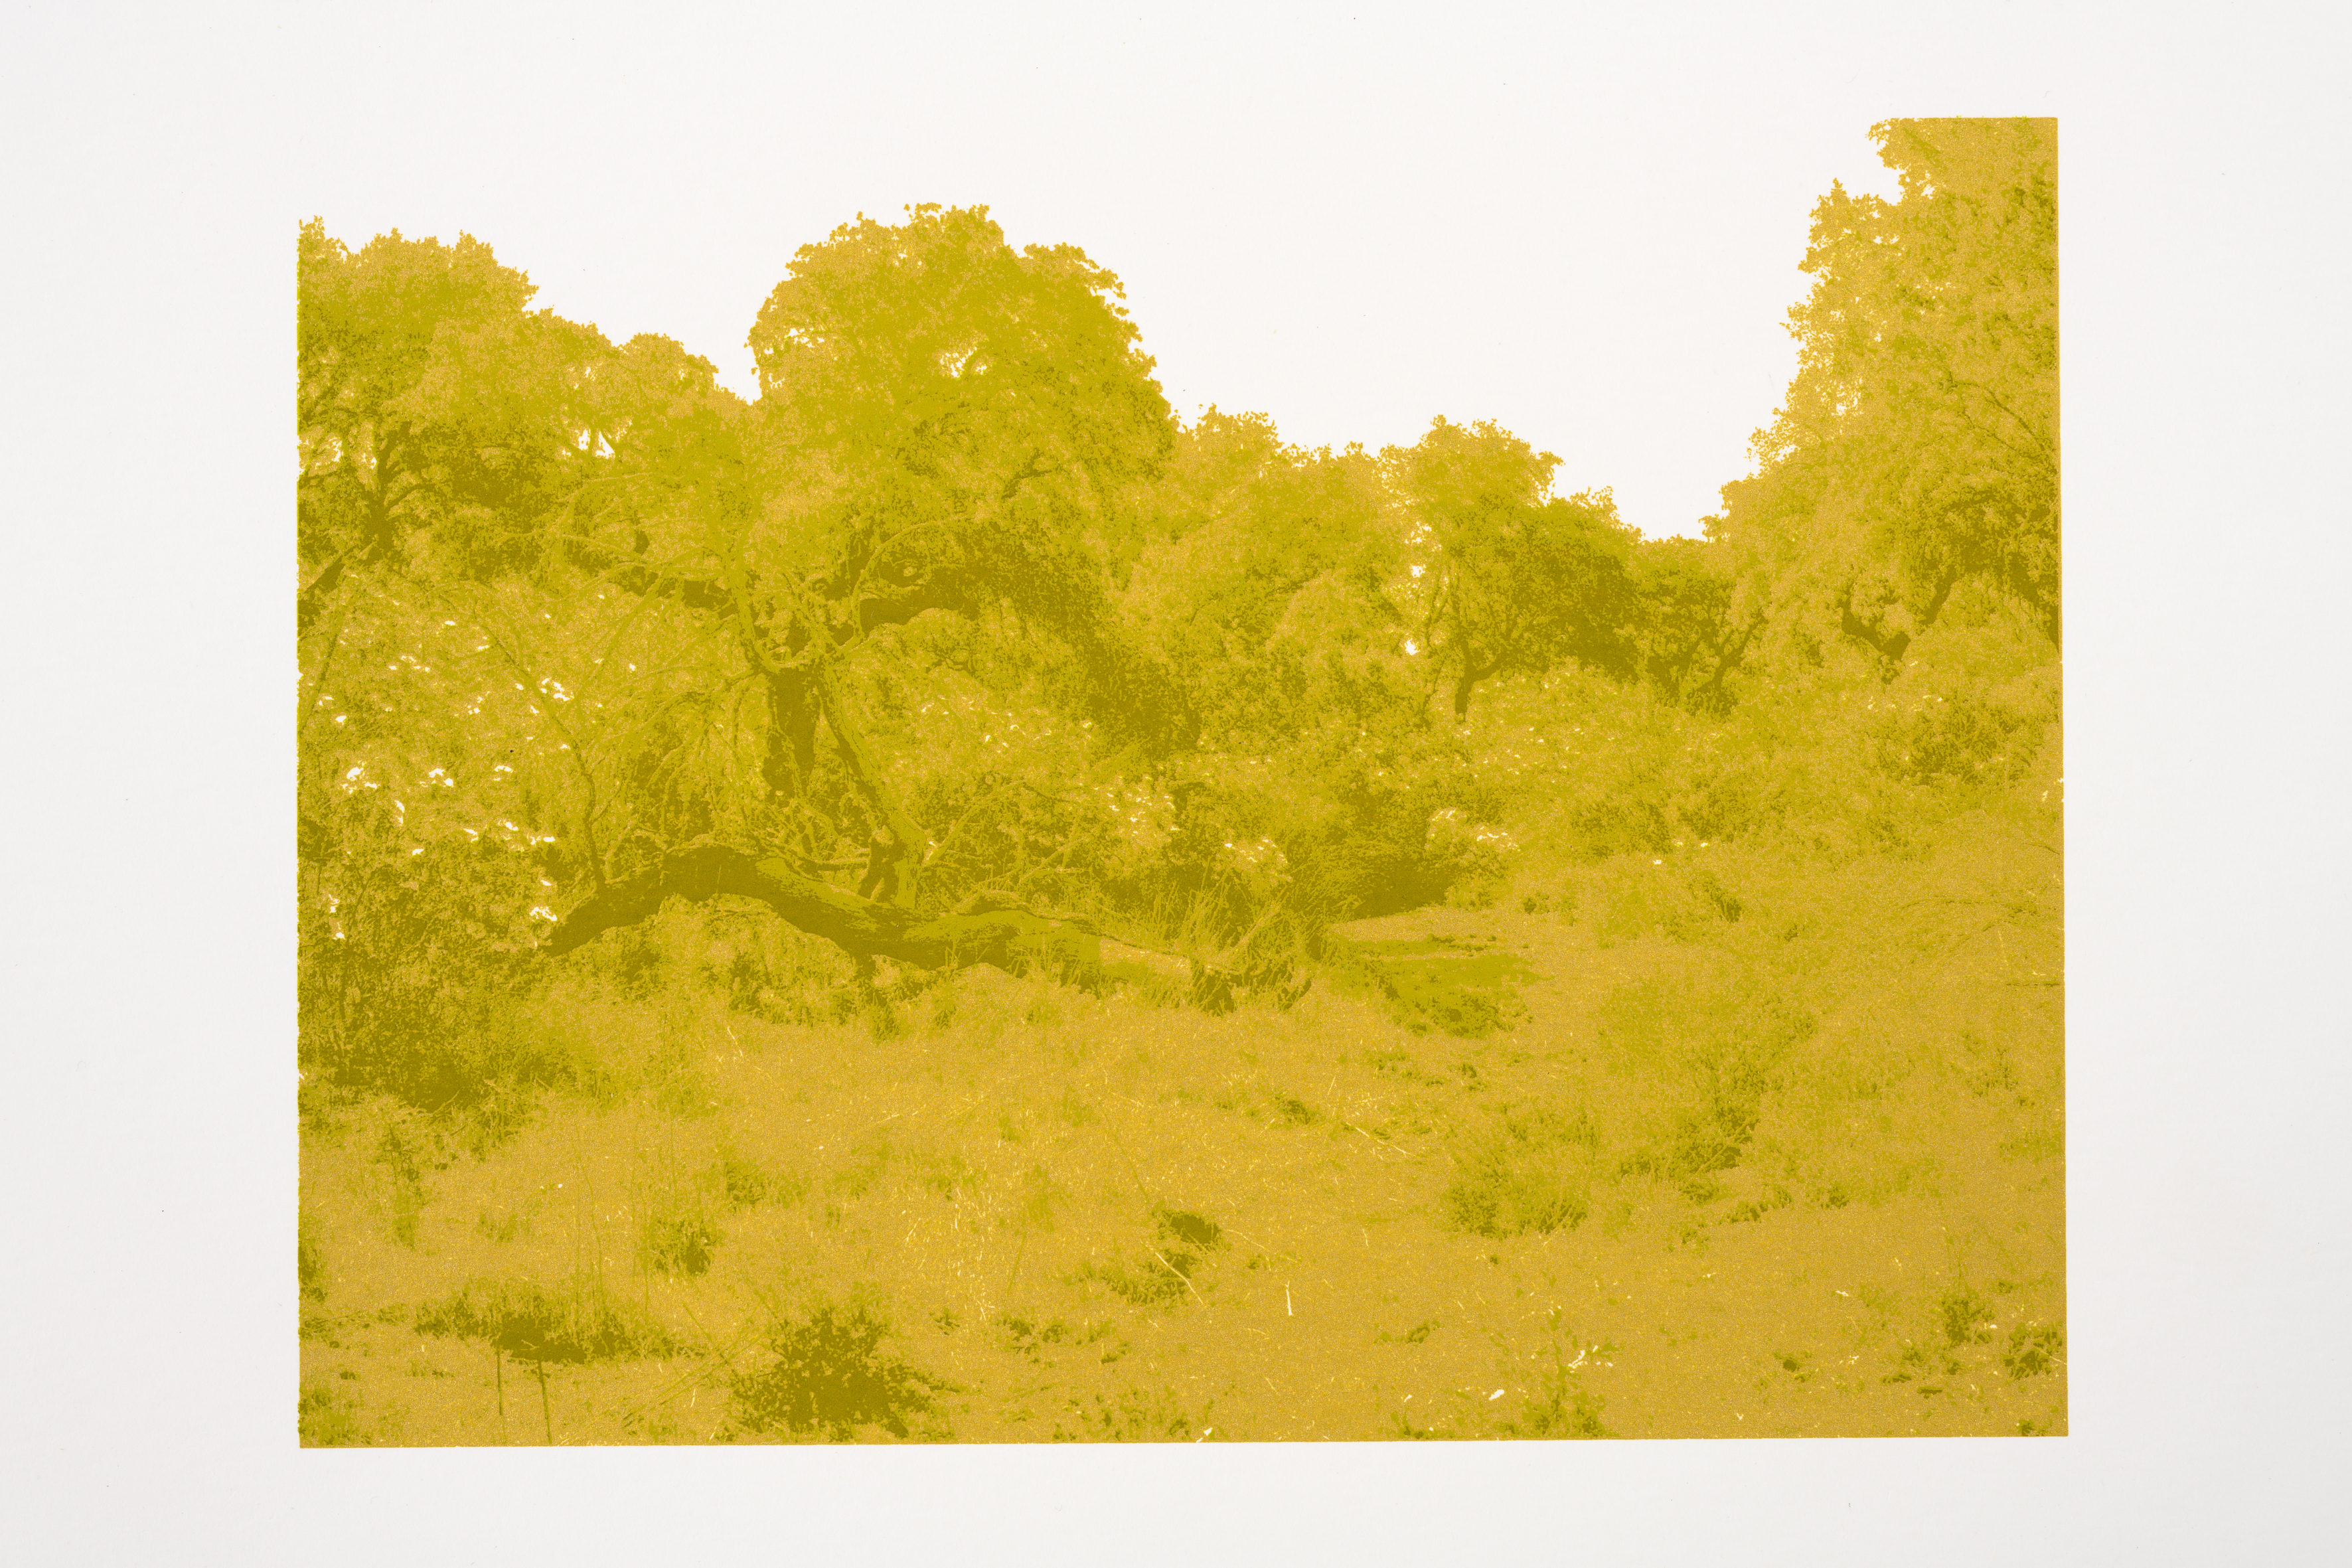 """Z.t."", (2019), 24 x 37 cm., three color silkscreenprint (Printed at Beeldenstorm/Daglicht 2019)"